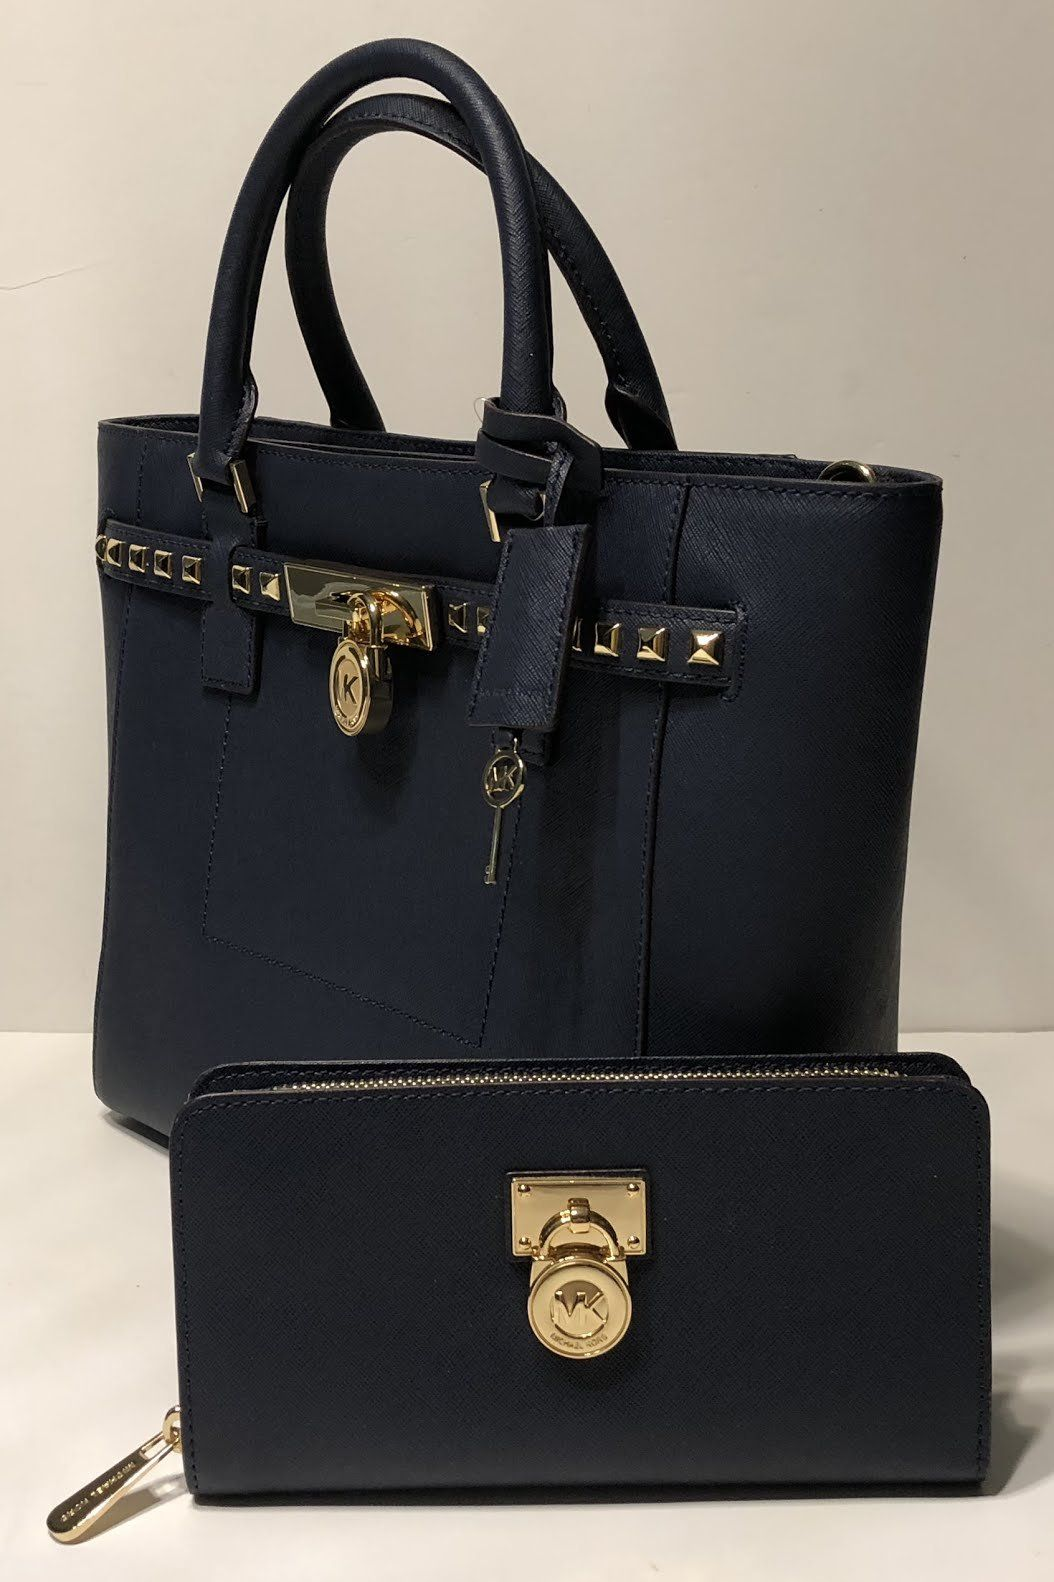 8403102915fc MICHAEL Michael Kors Hamilton Traveler Studded LG TZ Tote bundled with Michael  Kors Hamilton Traveler Zip Around Wallet Navy ** Details can be found by ...